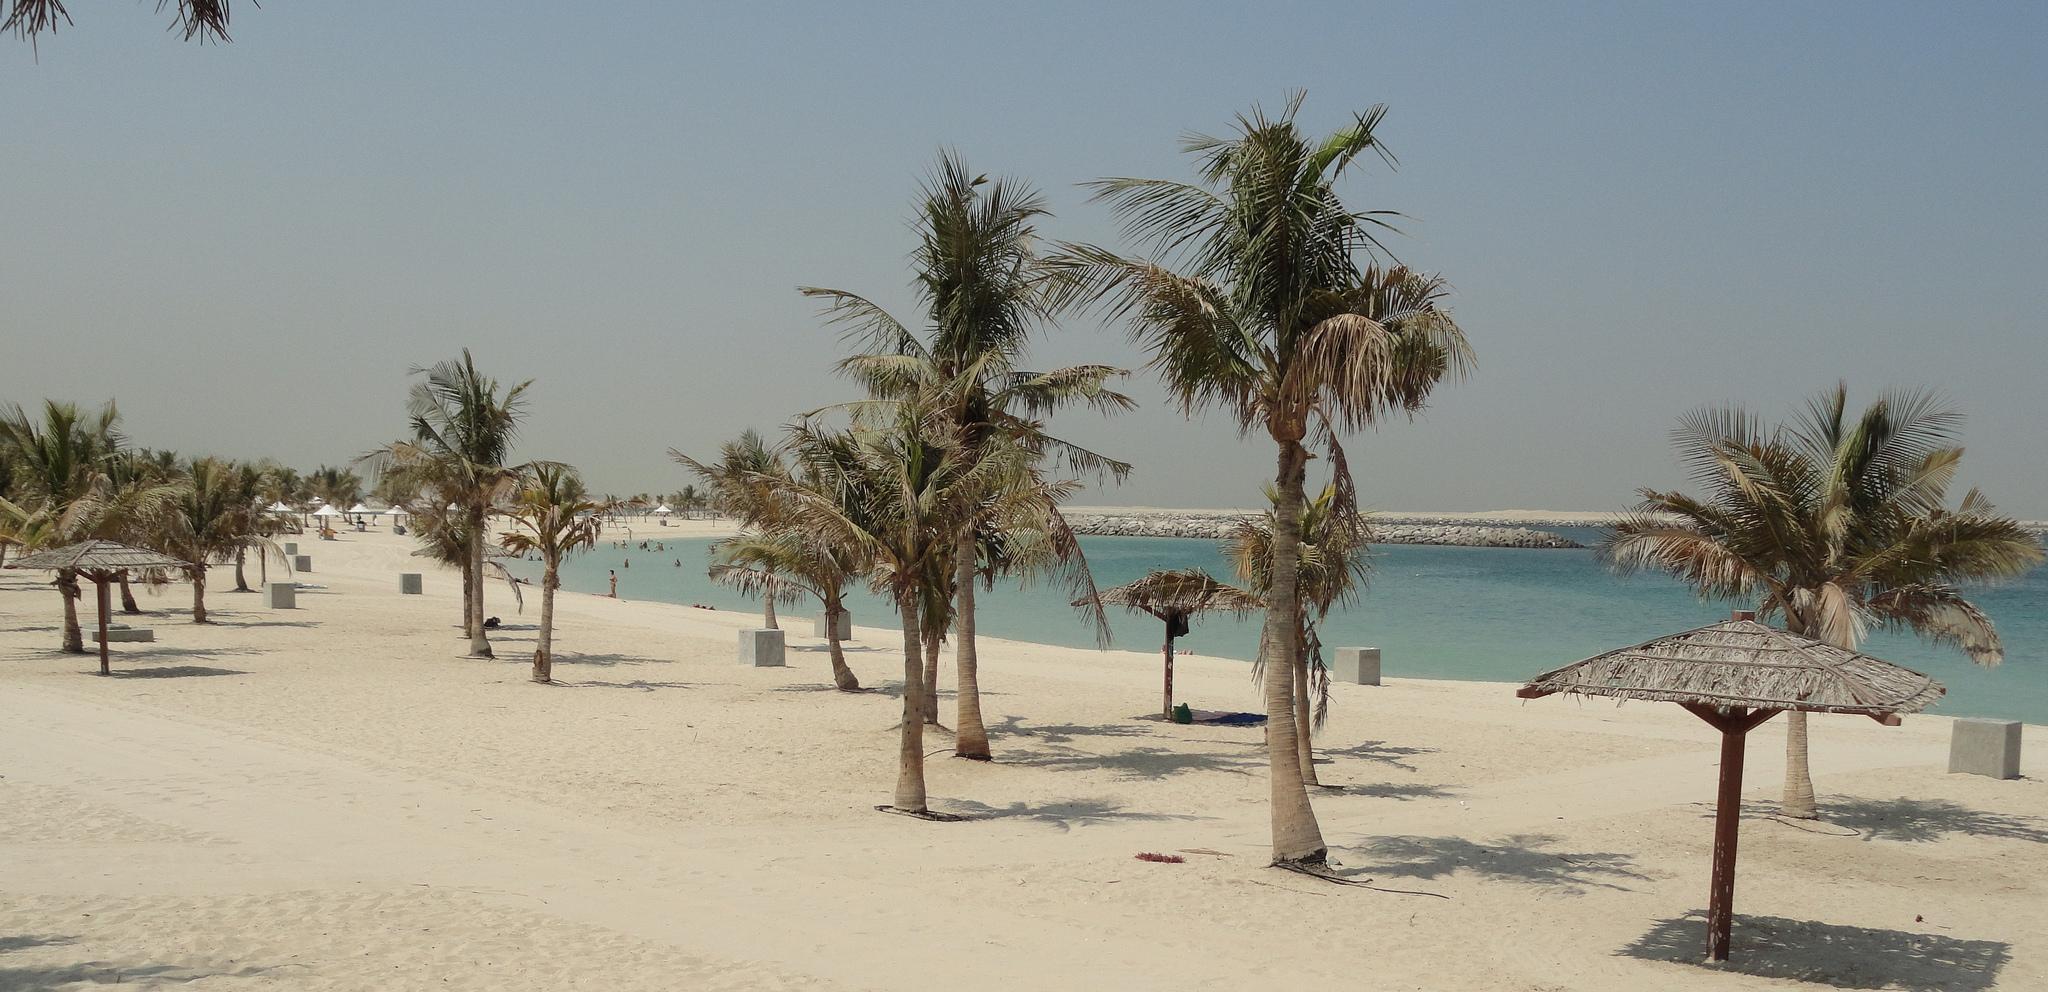 Фото пляжа Аль Мамзар